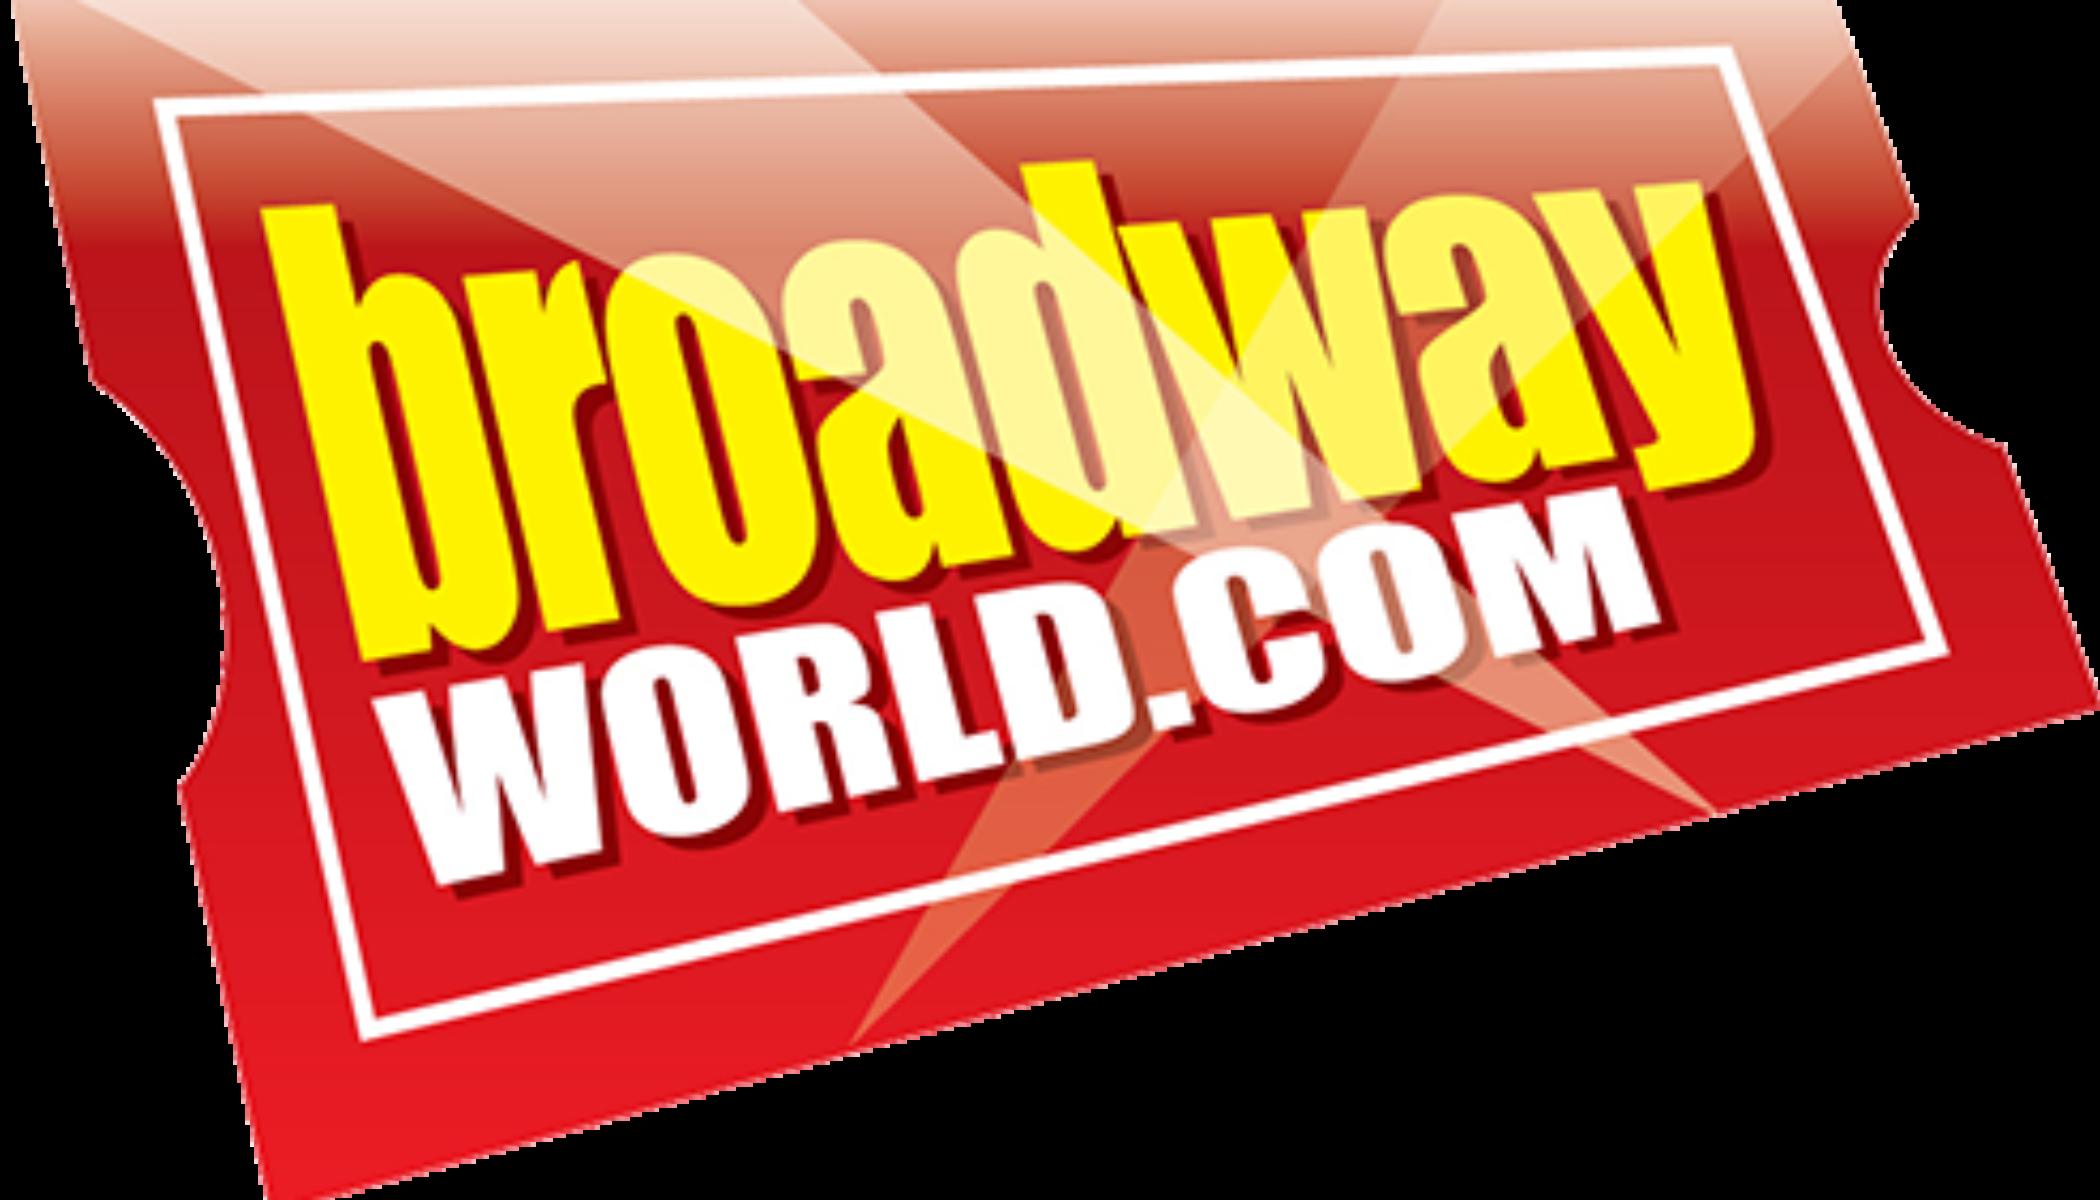 broadway-world-2100x1200.png